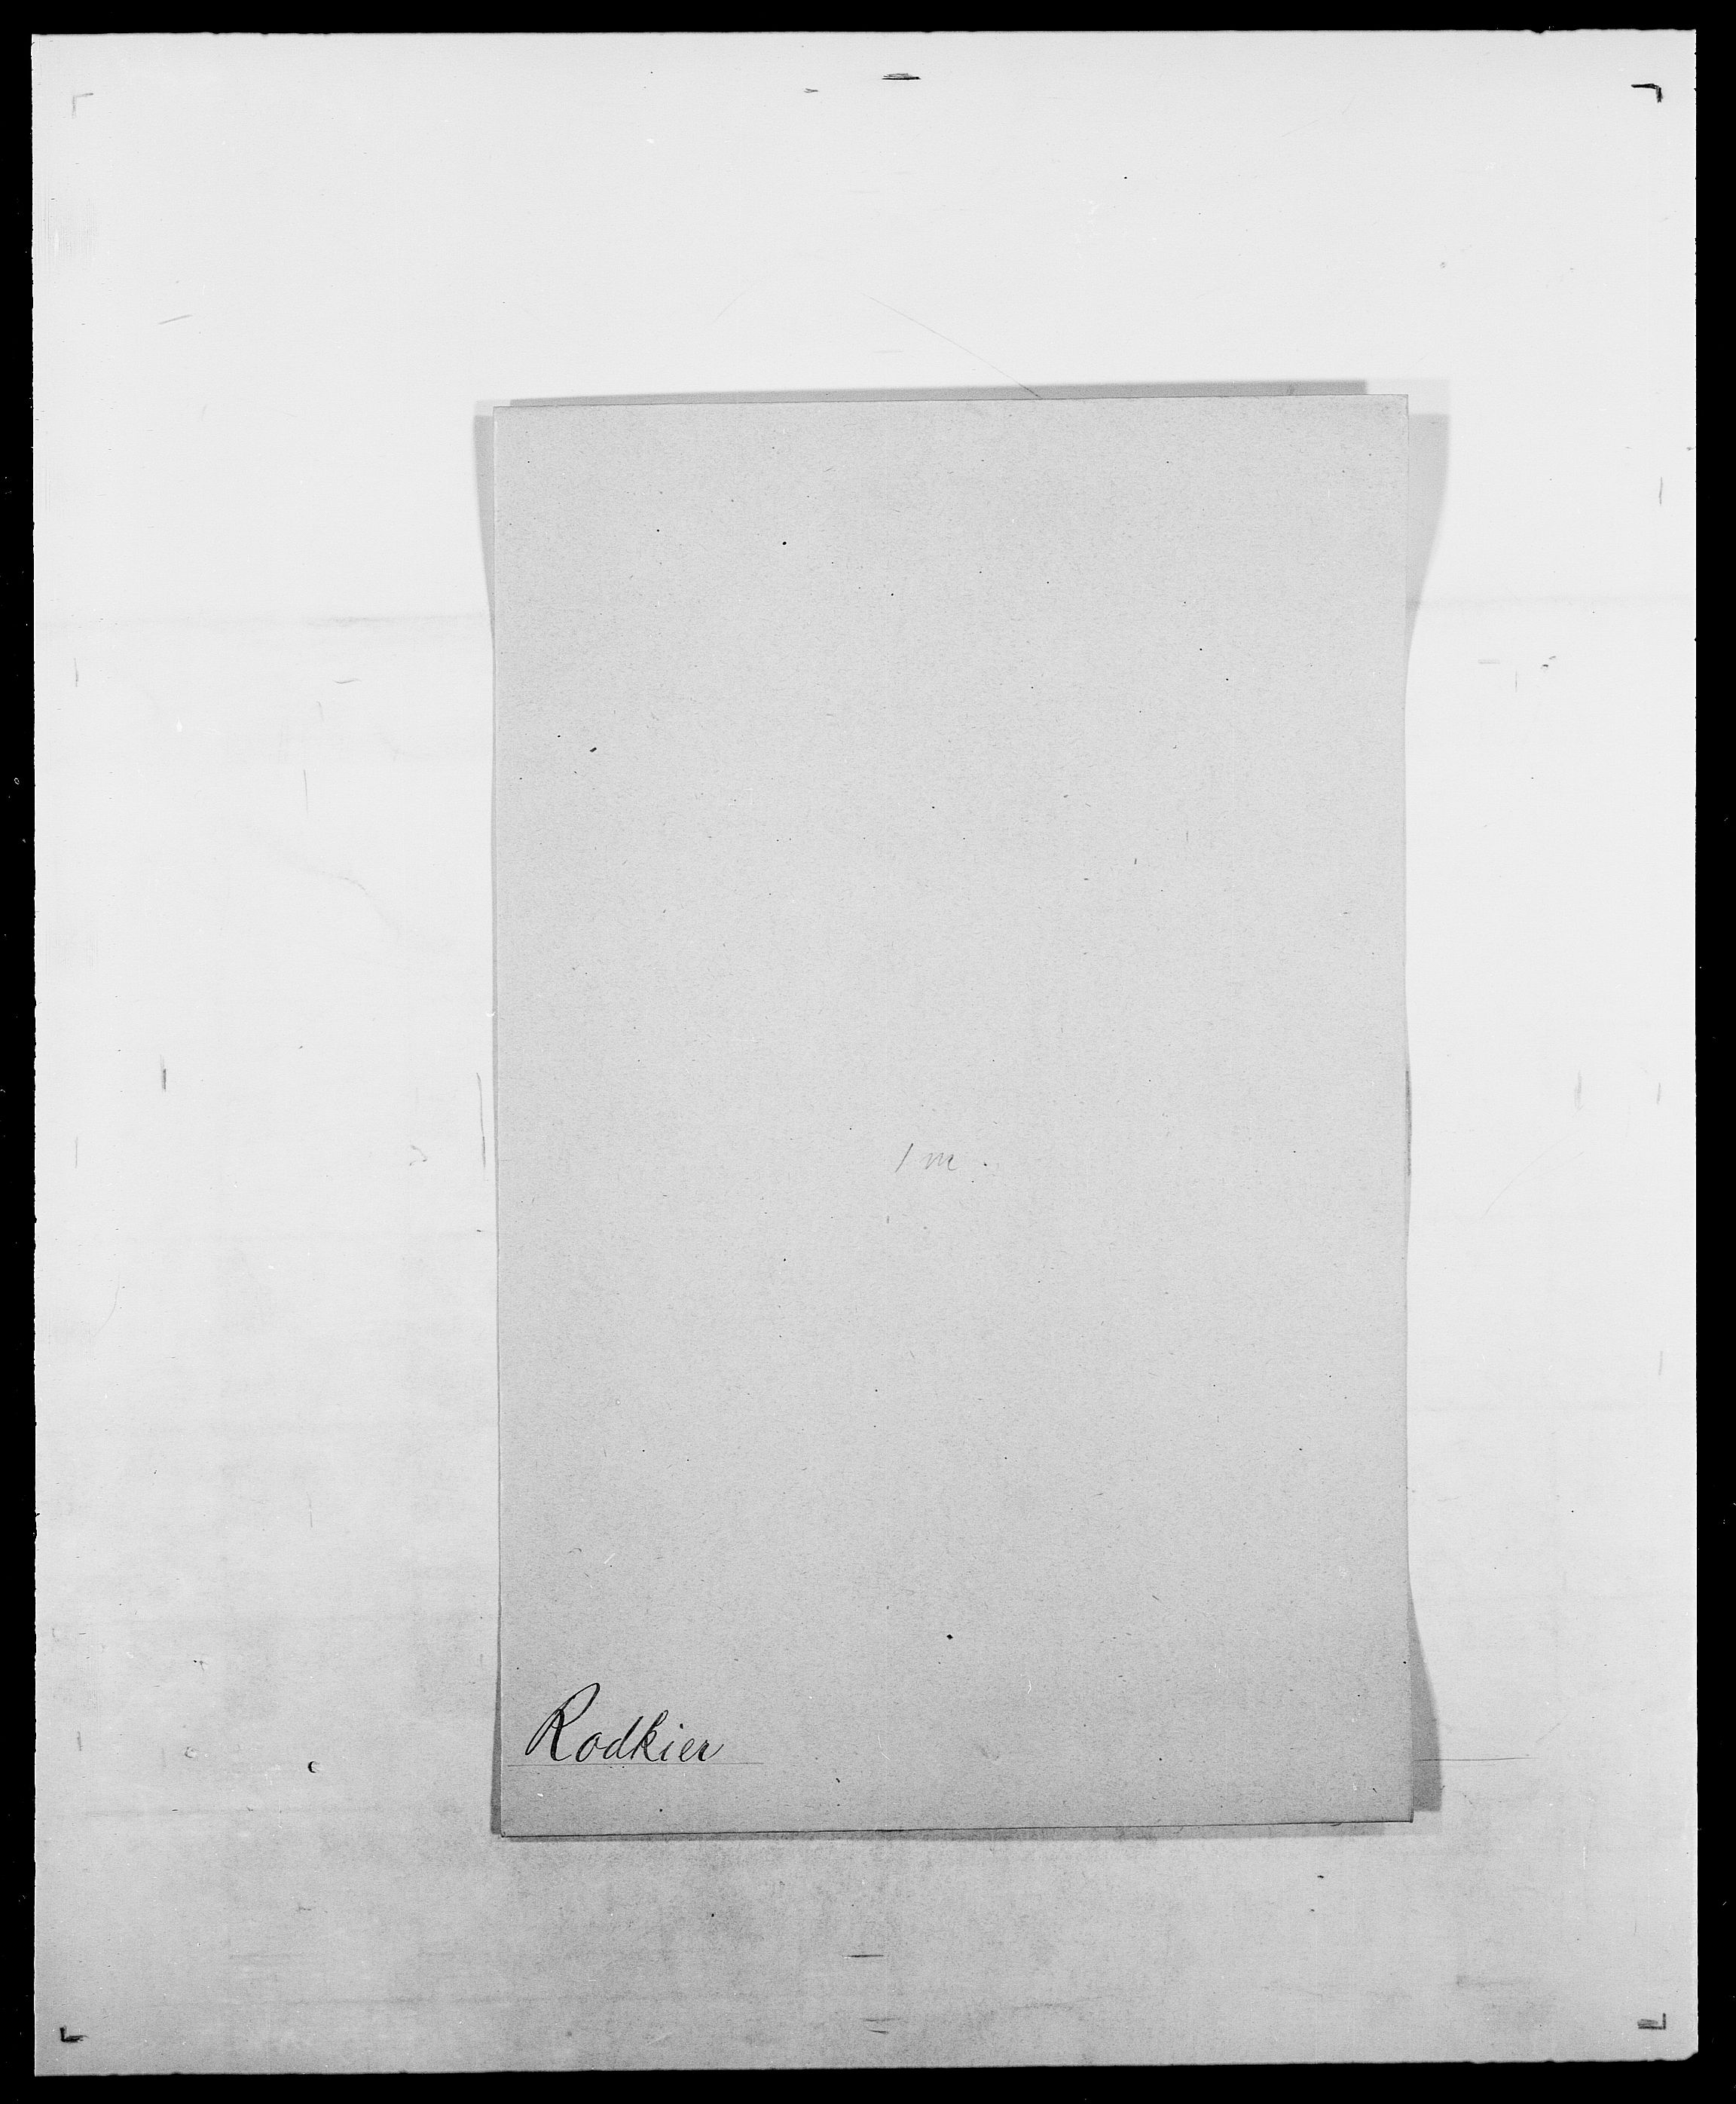 SAO, Delgobe, Charles Antoine - samling, D/Da/L0033: Roald - Røyem, s. 51